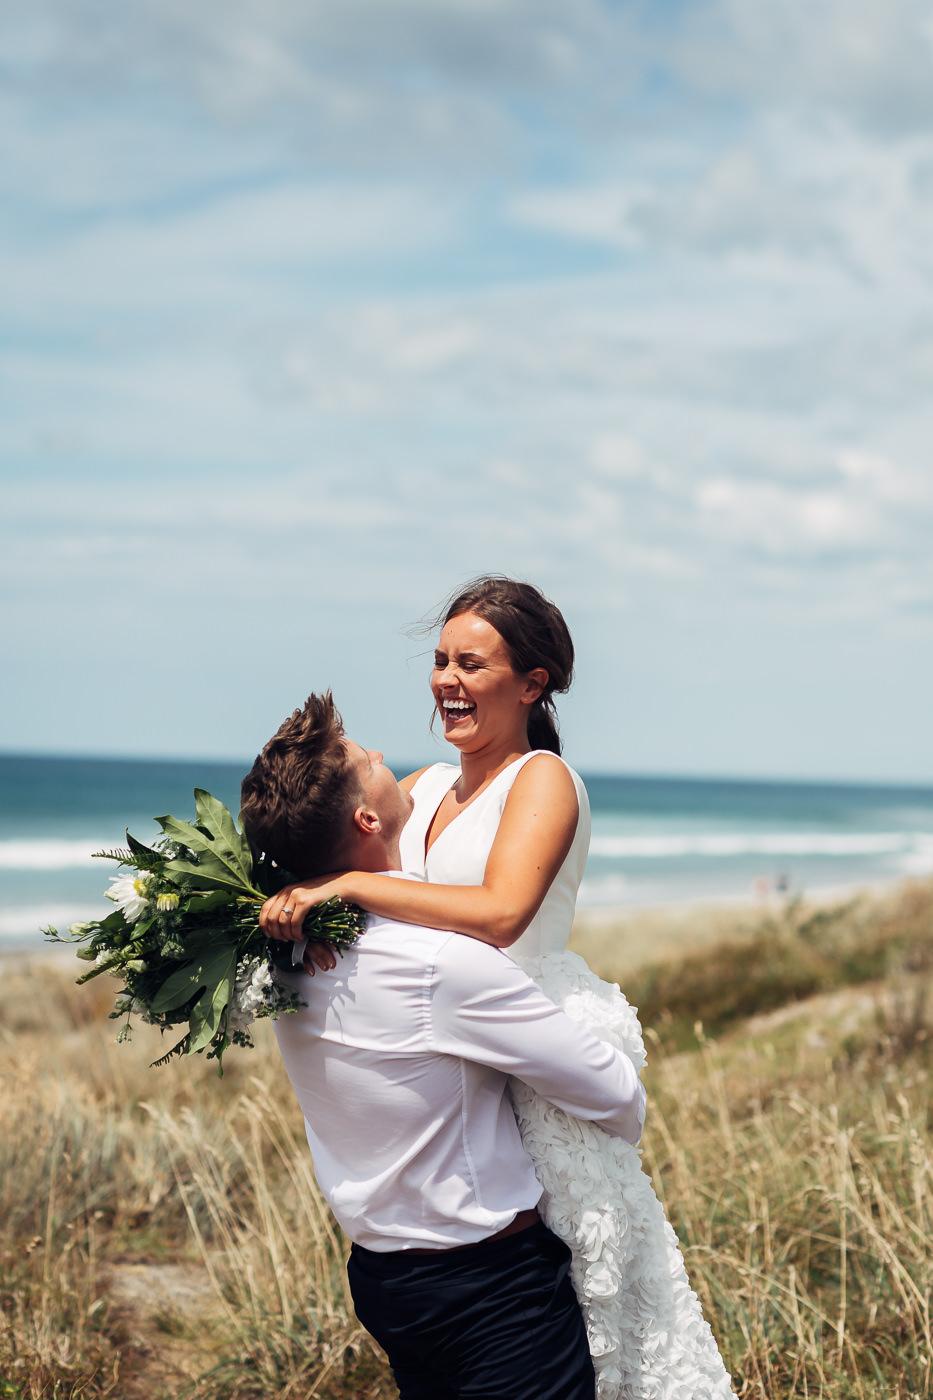 Anne-Hilde & Pieter - januarbryllup i slående vakre Tauranga, New Zealand Bryllupsfotograf New Zealand strand 13 Brudepar